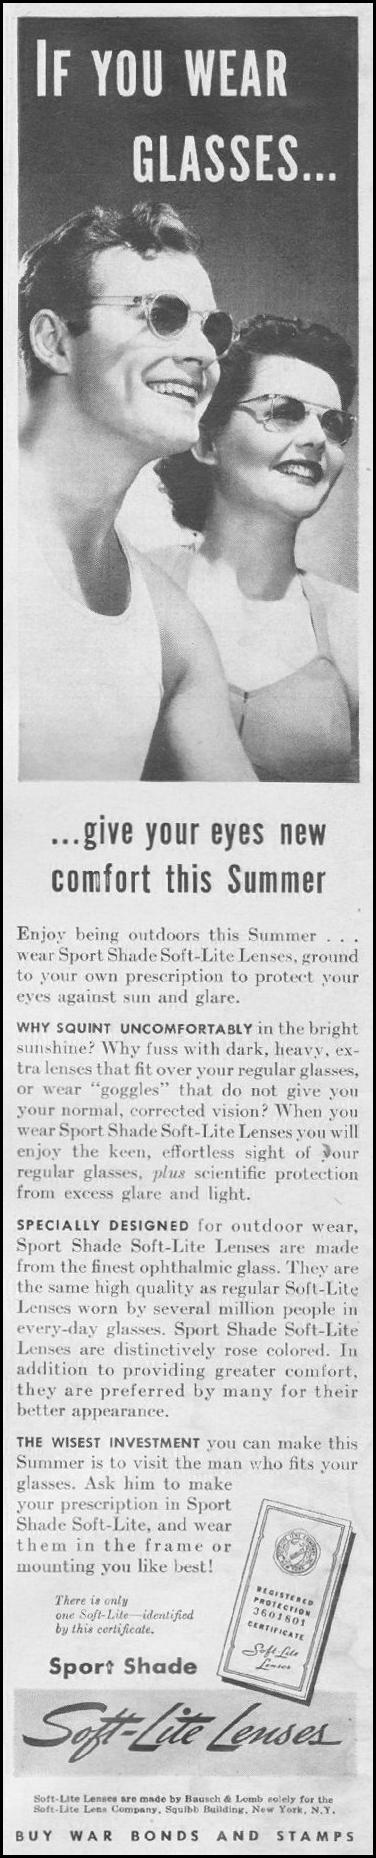 SOFT-LITE LENSES LIFE 06/22/1942 p. 2